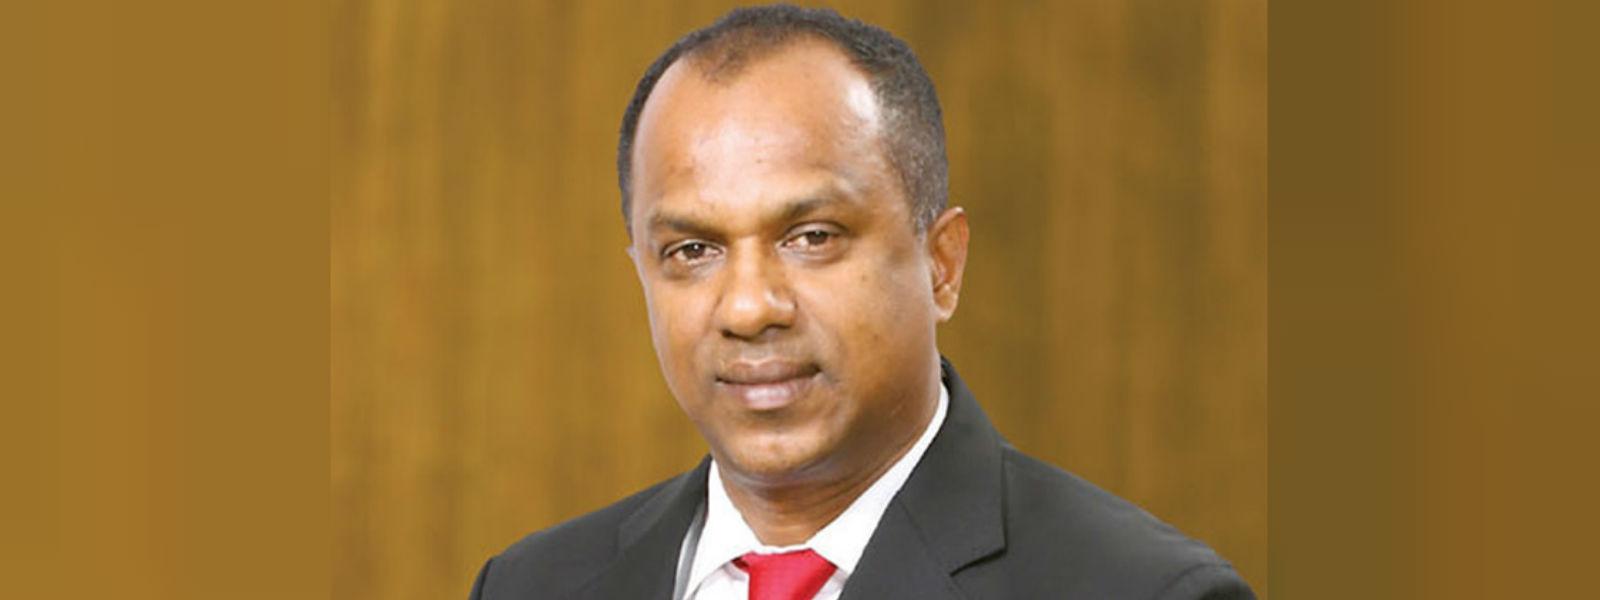 Overseas travel ban for Businessman Nimal Perera – linked to UL re-fleet deal